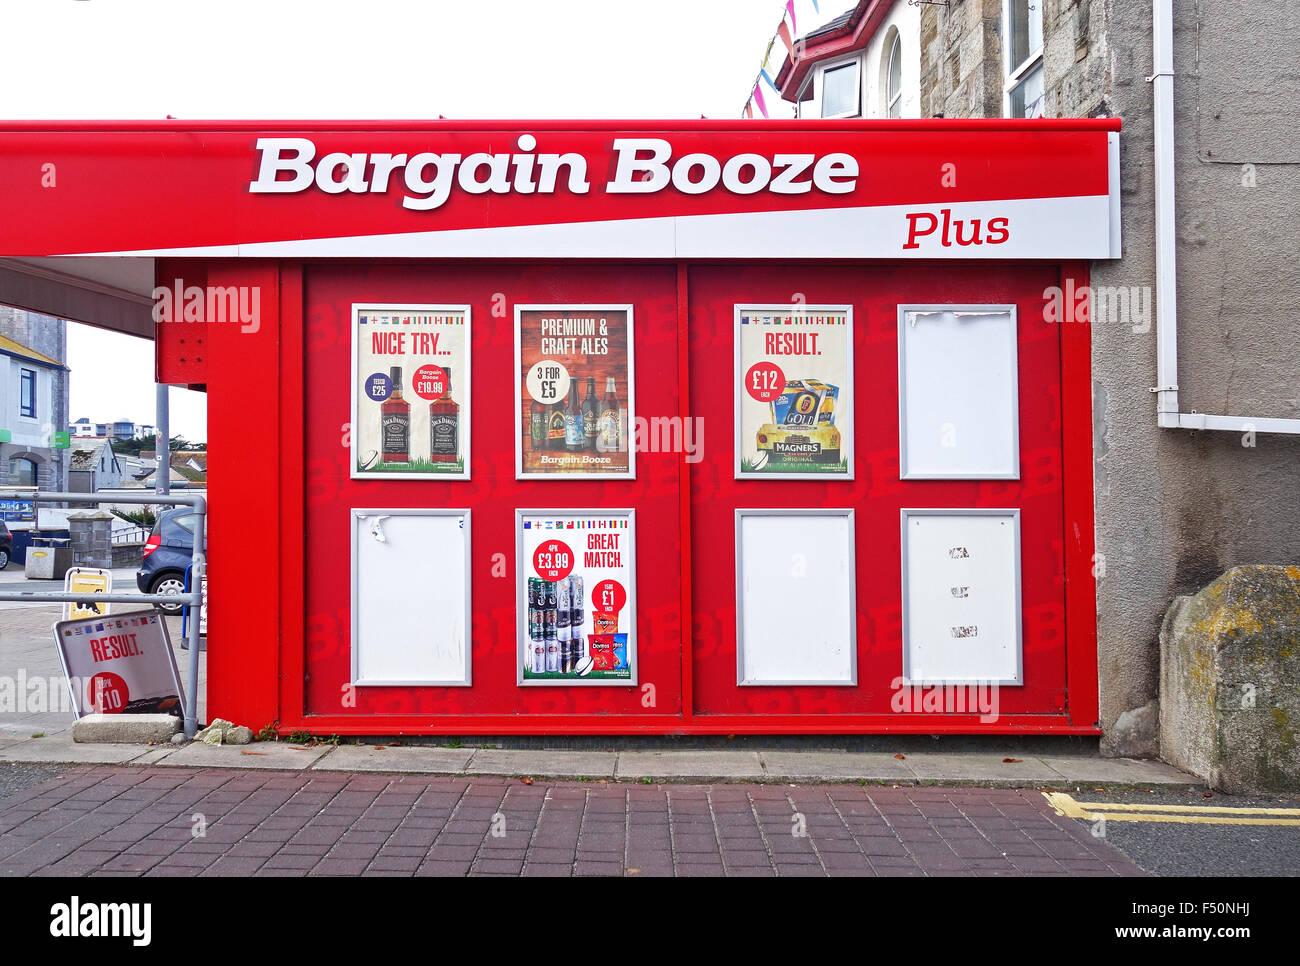 A Bargain Booze store - Stock Image